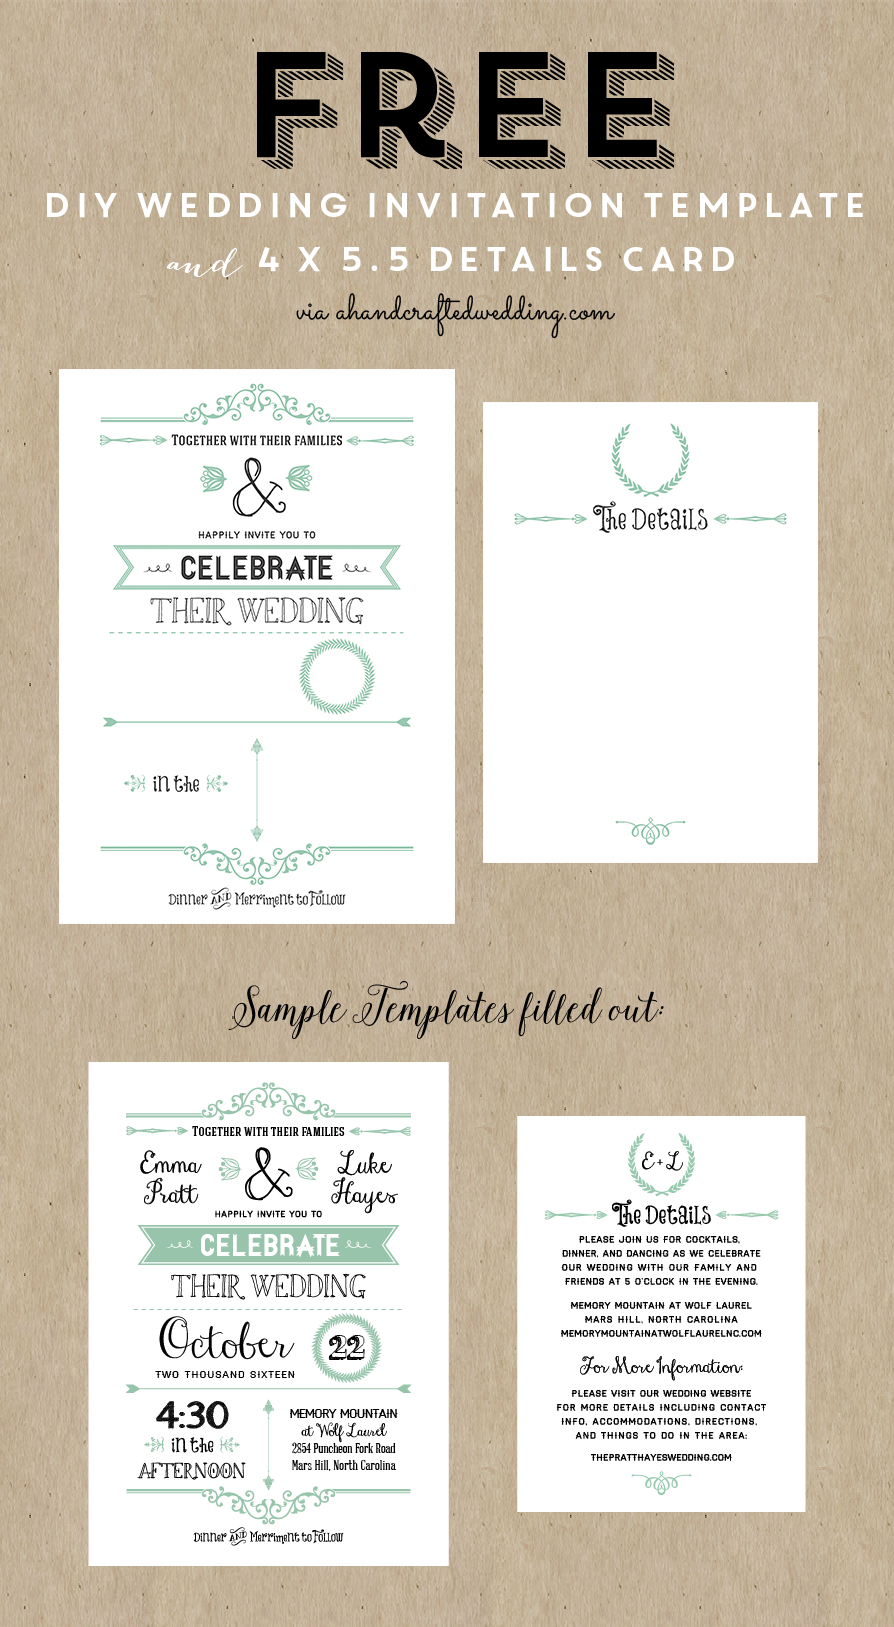 Free Printable Wedding Invitation Template | Wedding | Pinterest - Free Printable Wedding Invitations